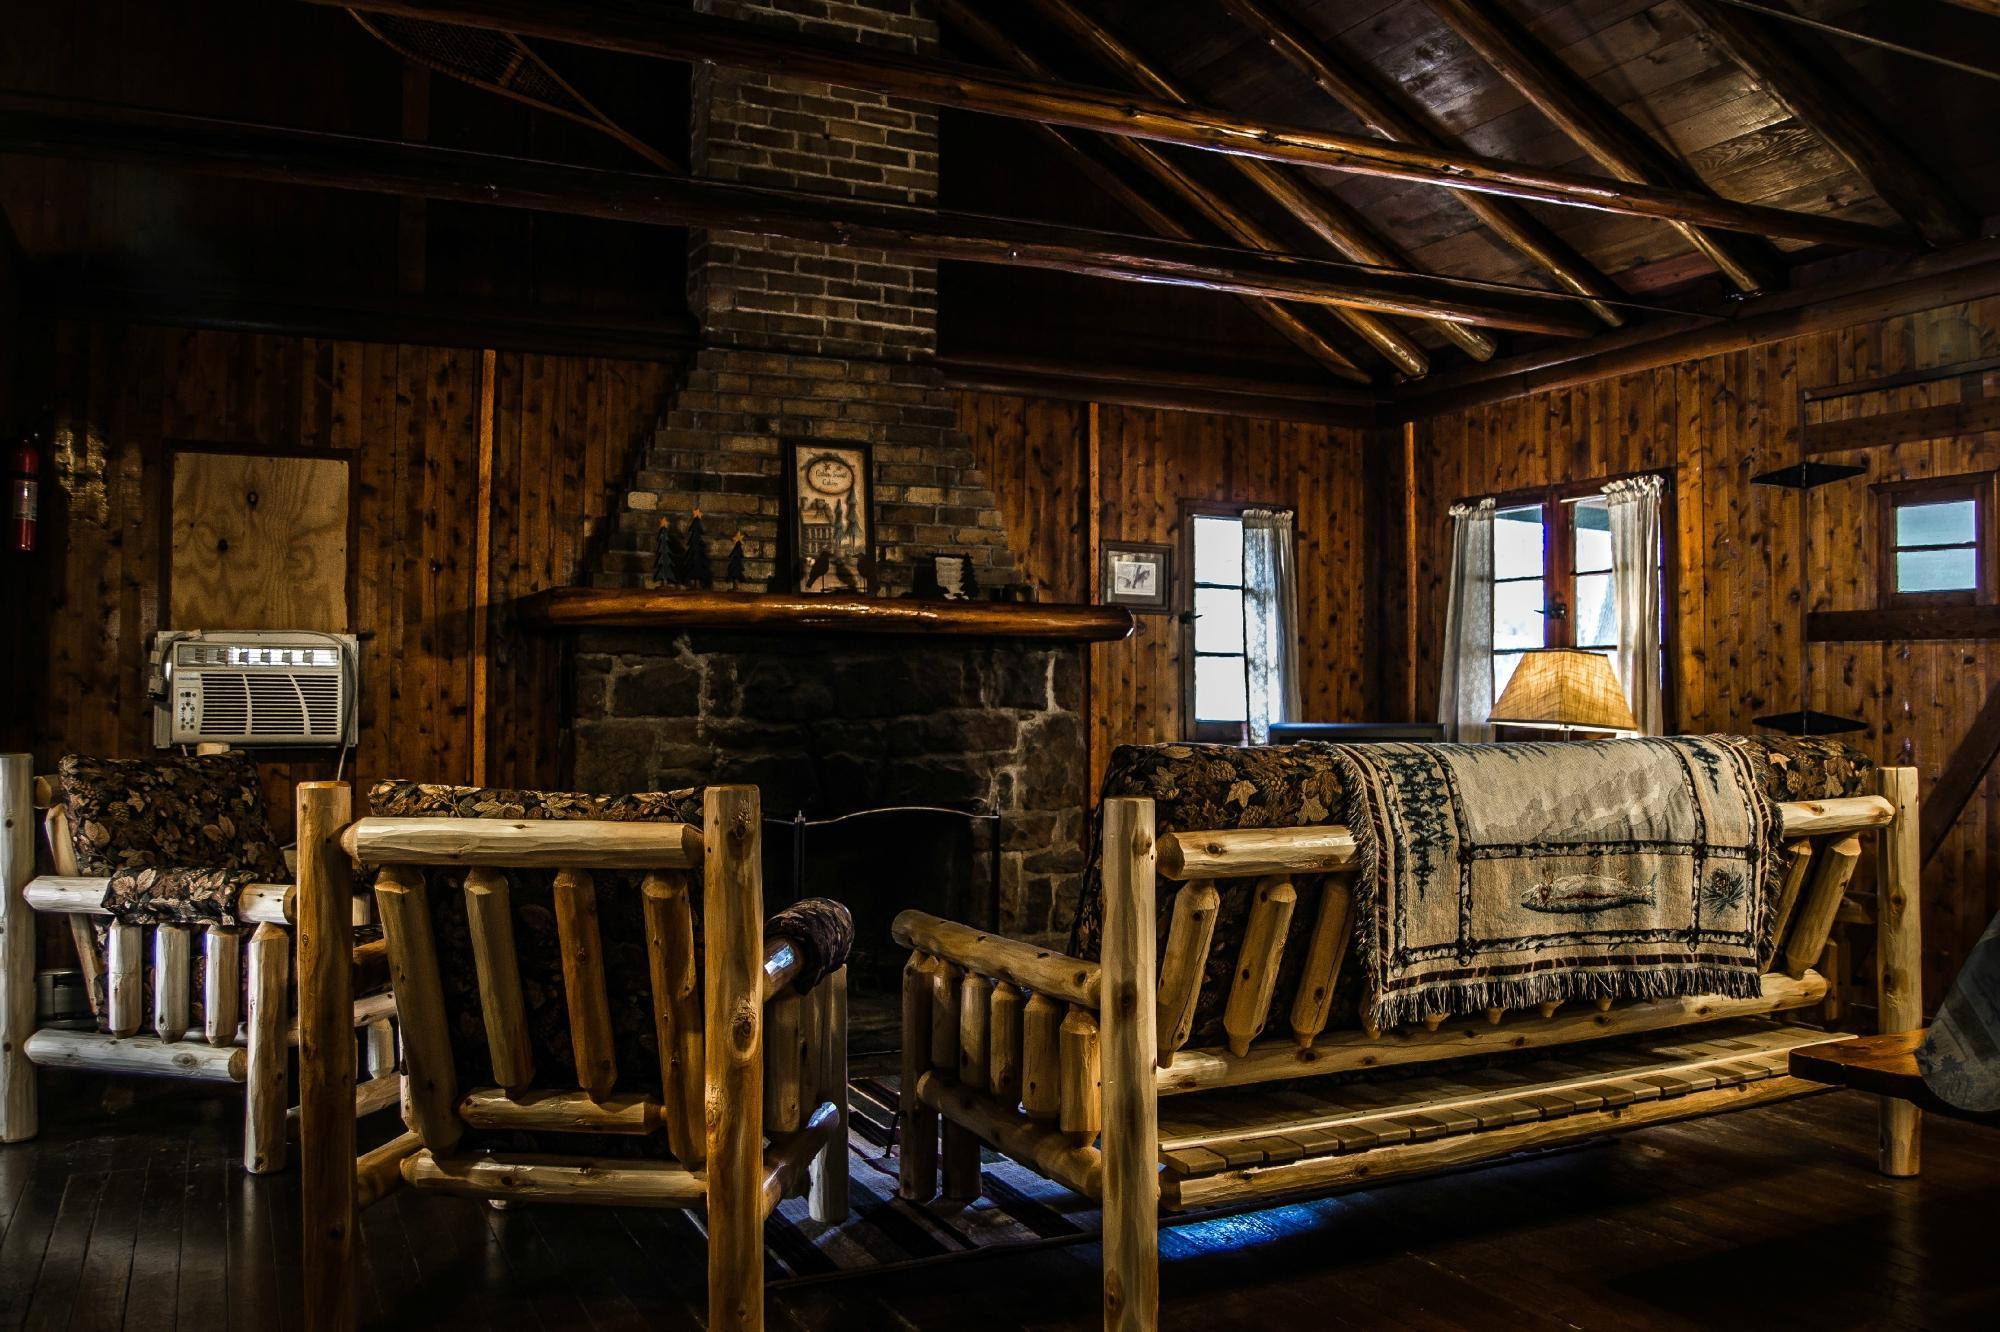 Hominy Ridge Lodge and Cabins